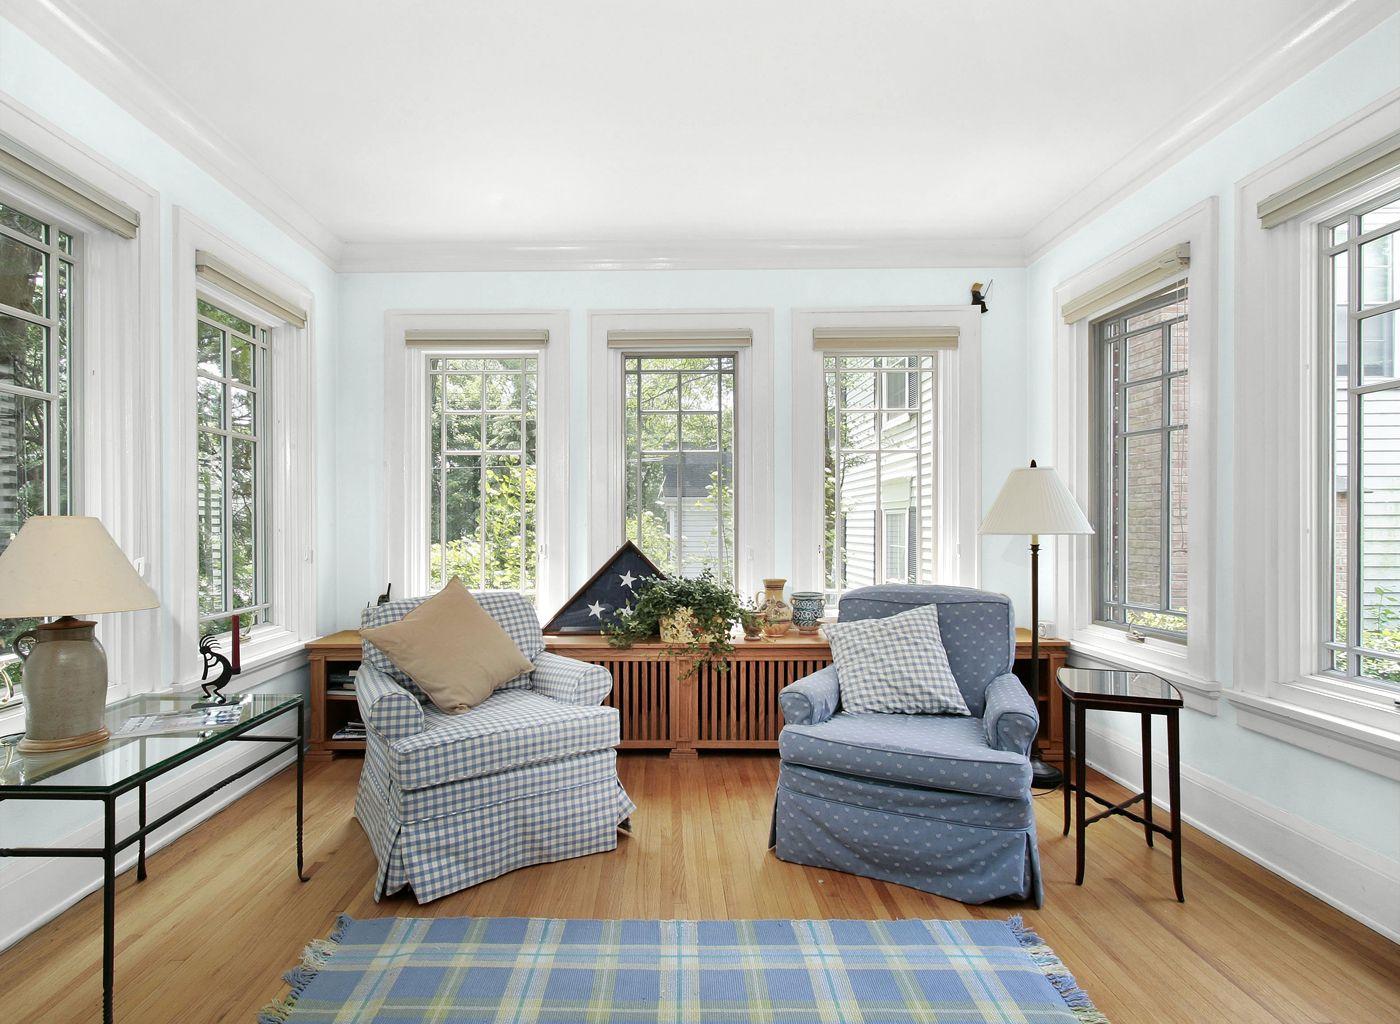 Living Room in Cloud Nine Blue | Living Rooms | Pinterest | Living ...